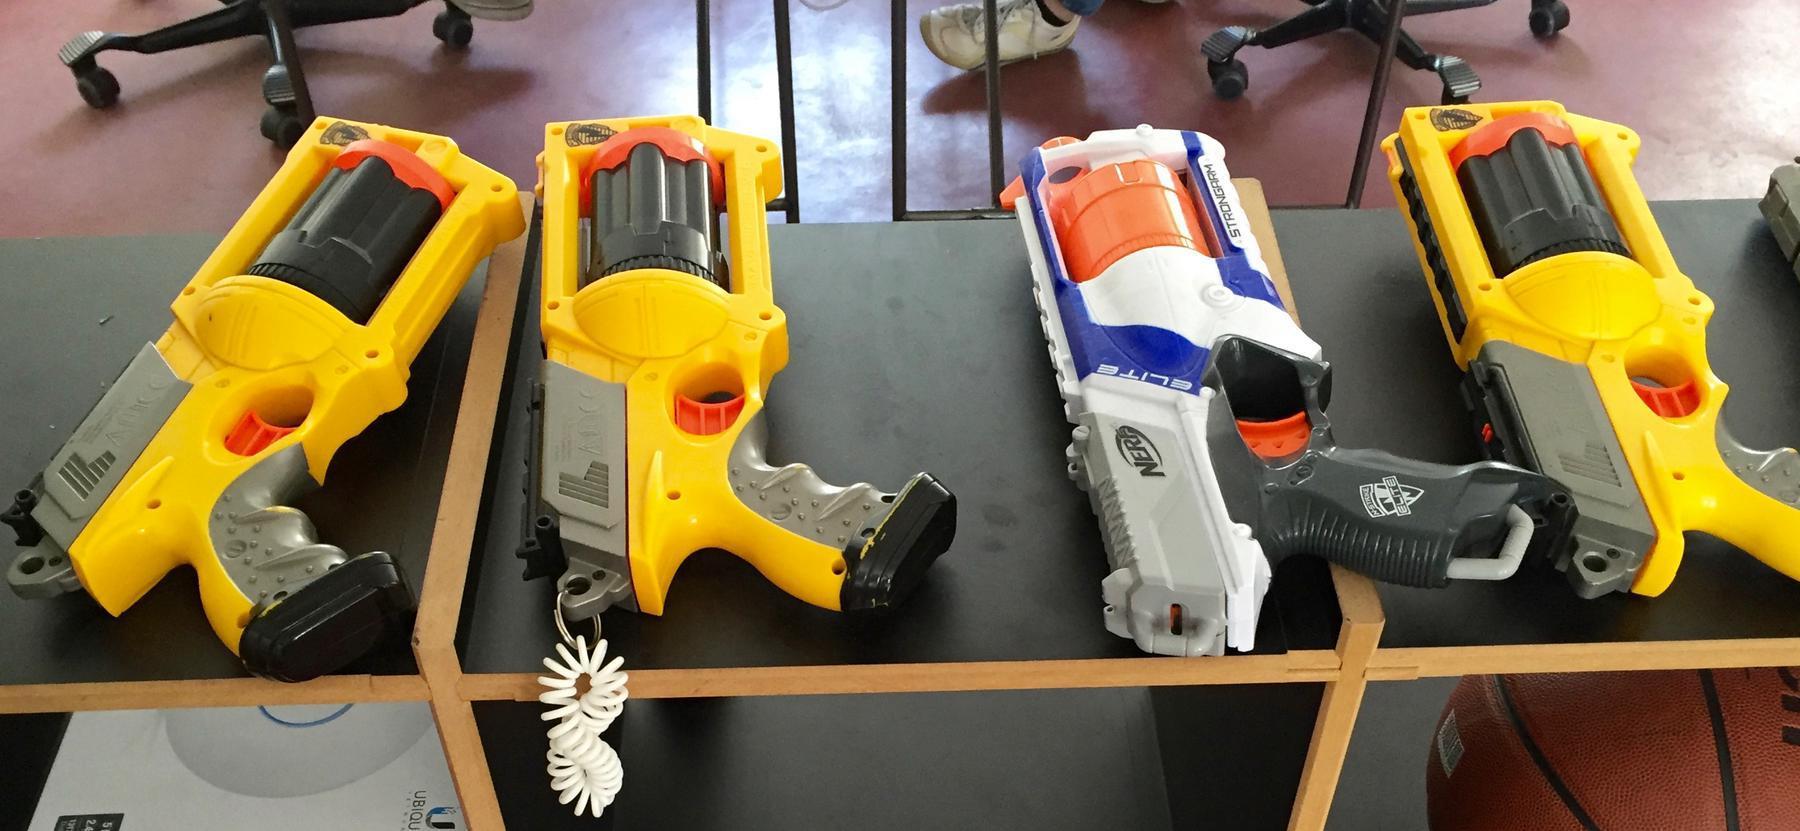 welance-water-pistols